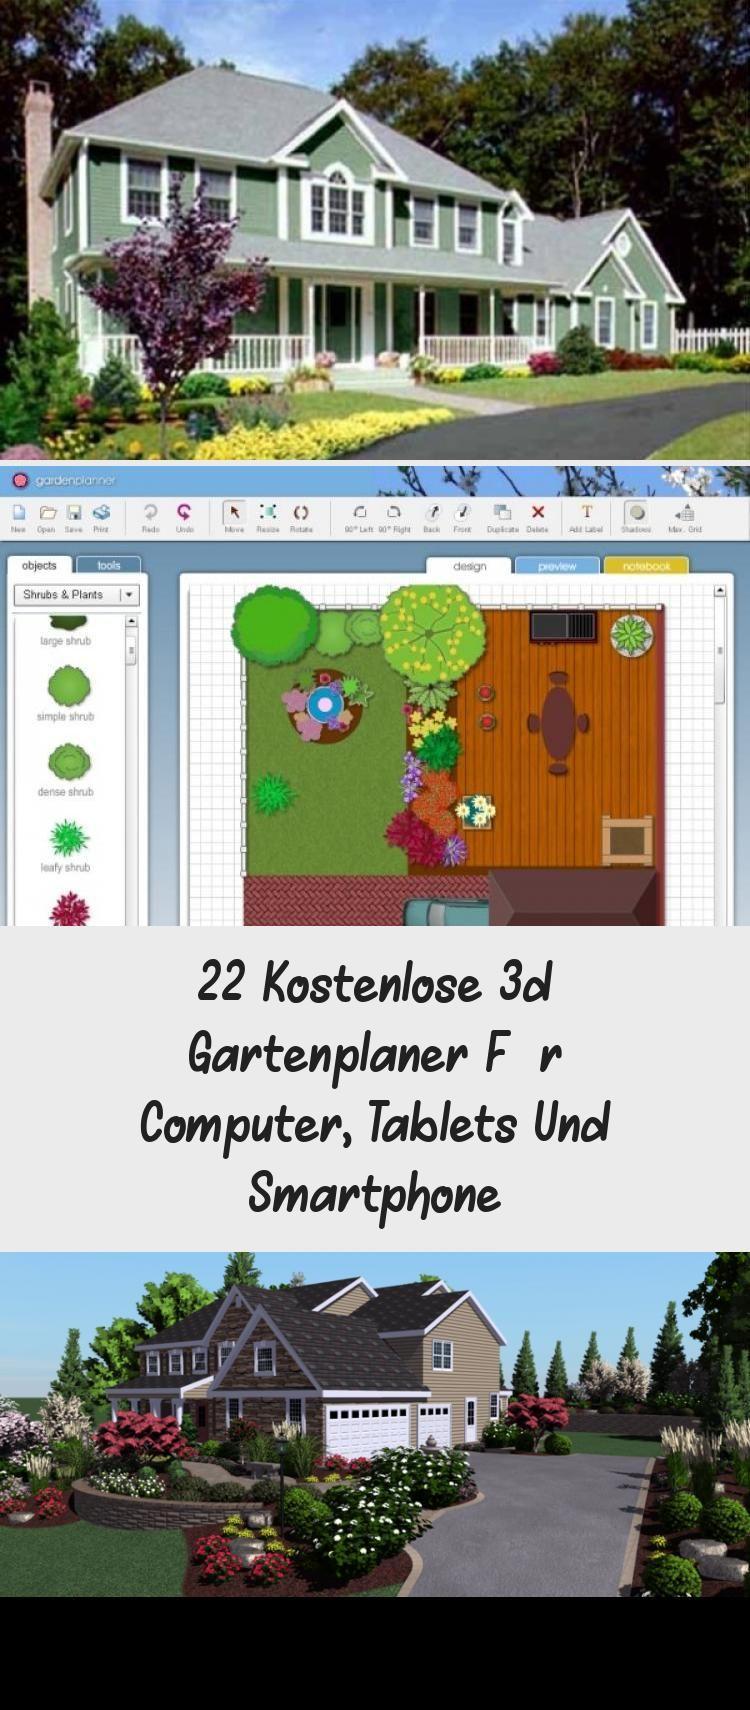 Planer Landschaftsbau Online Software Mein Schoener Garten Planungstool Gartenplanunggestaltung Gartenplanunghang Gartenpl In 2020 Outdoor Structures Outdoor Shrubs